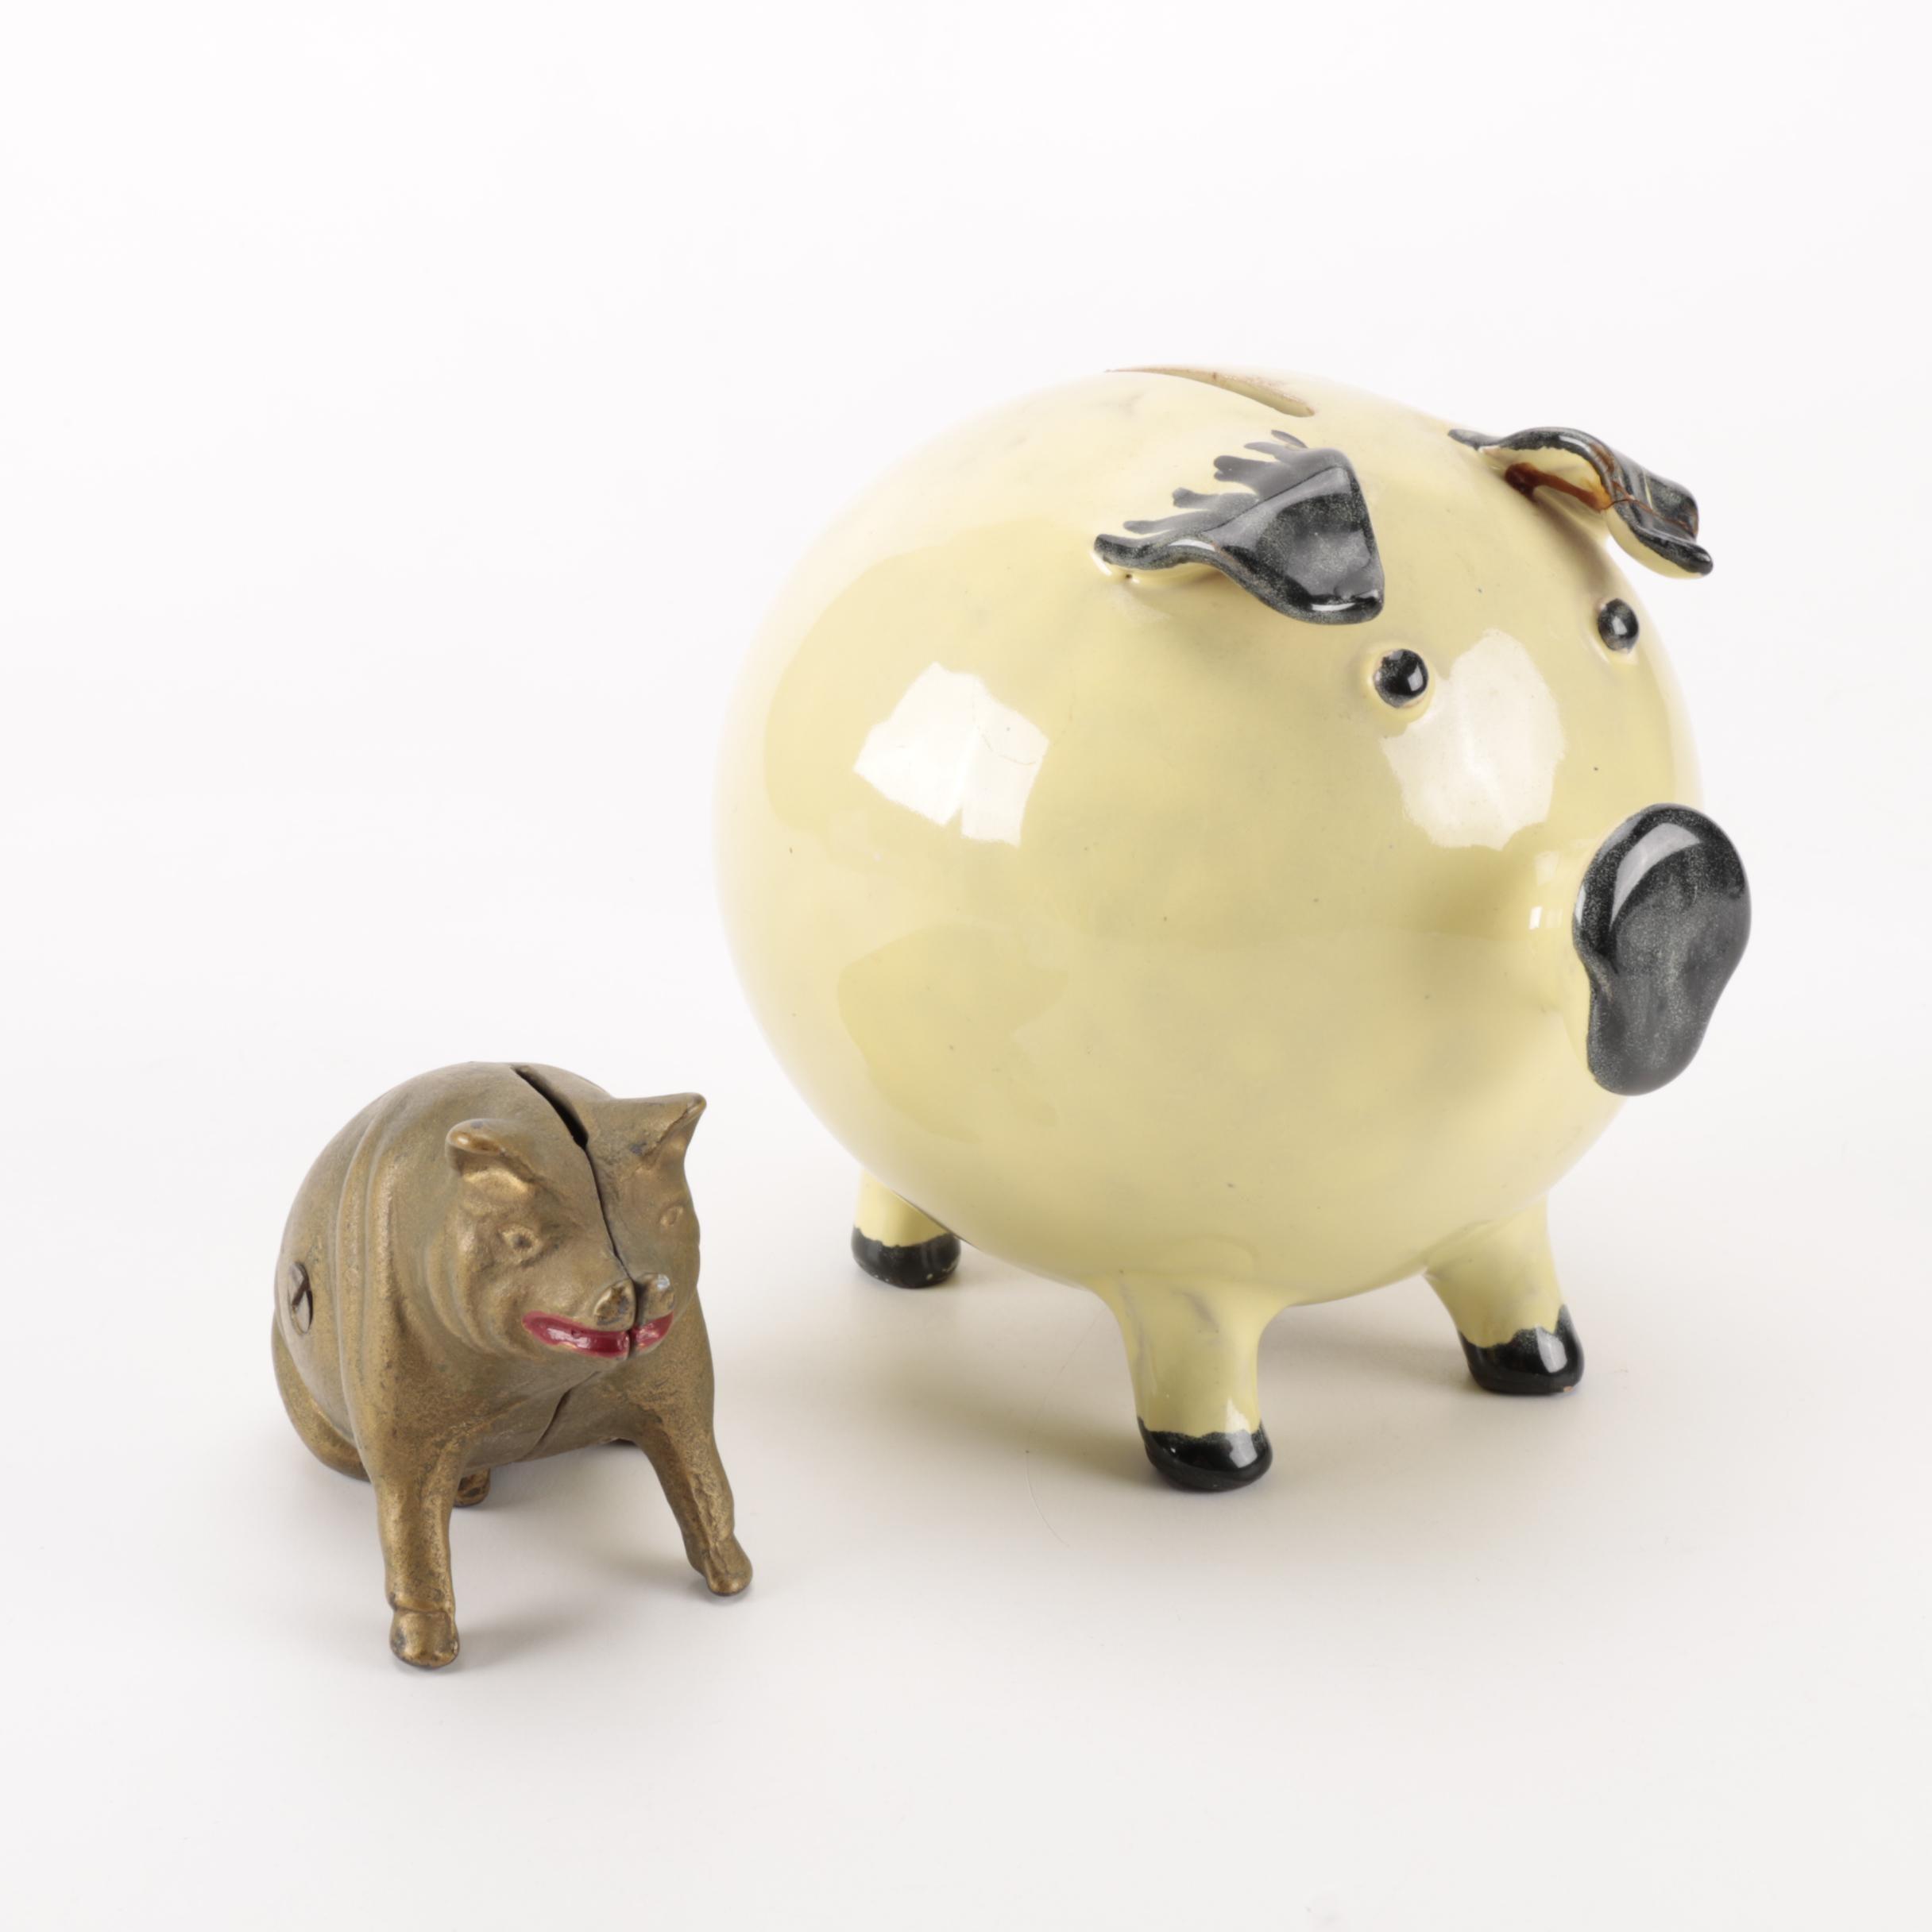 Pair of Piggy Banks